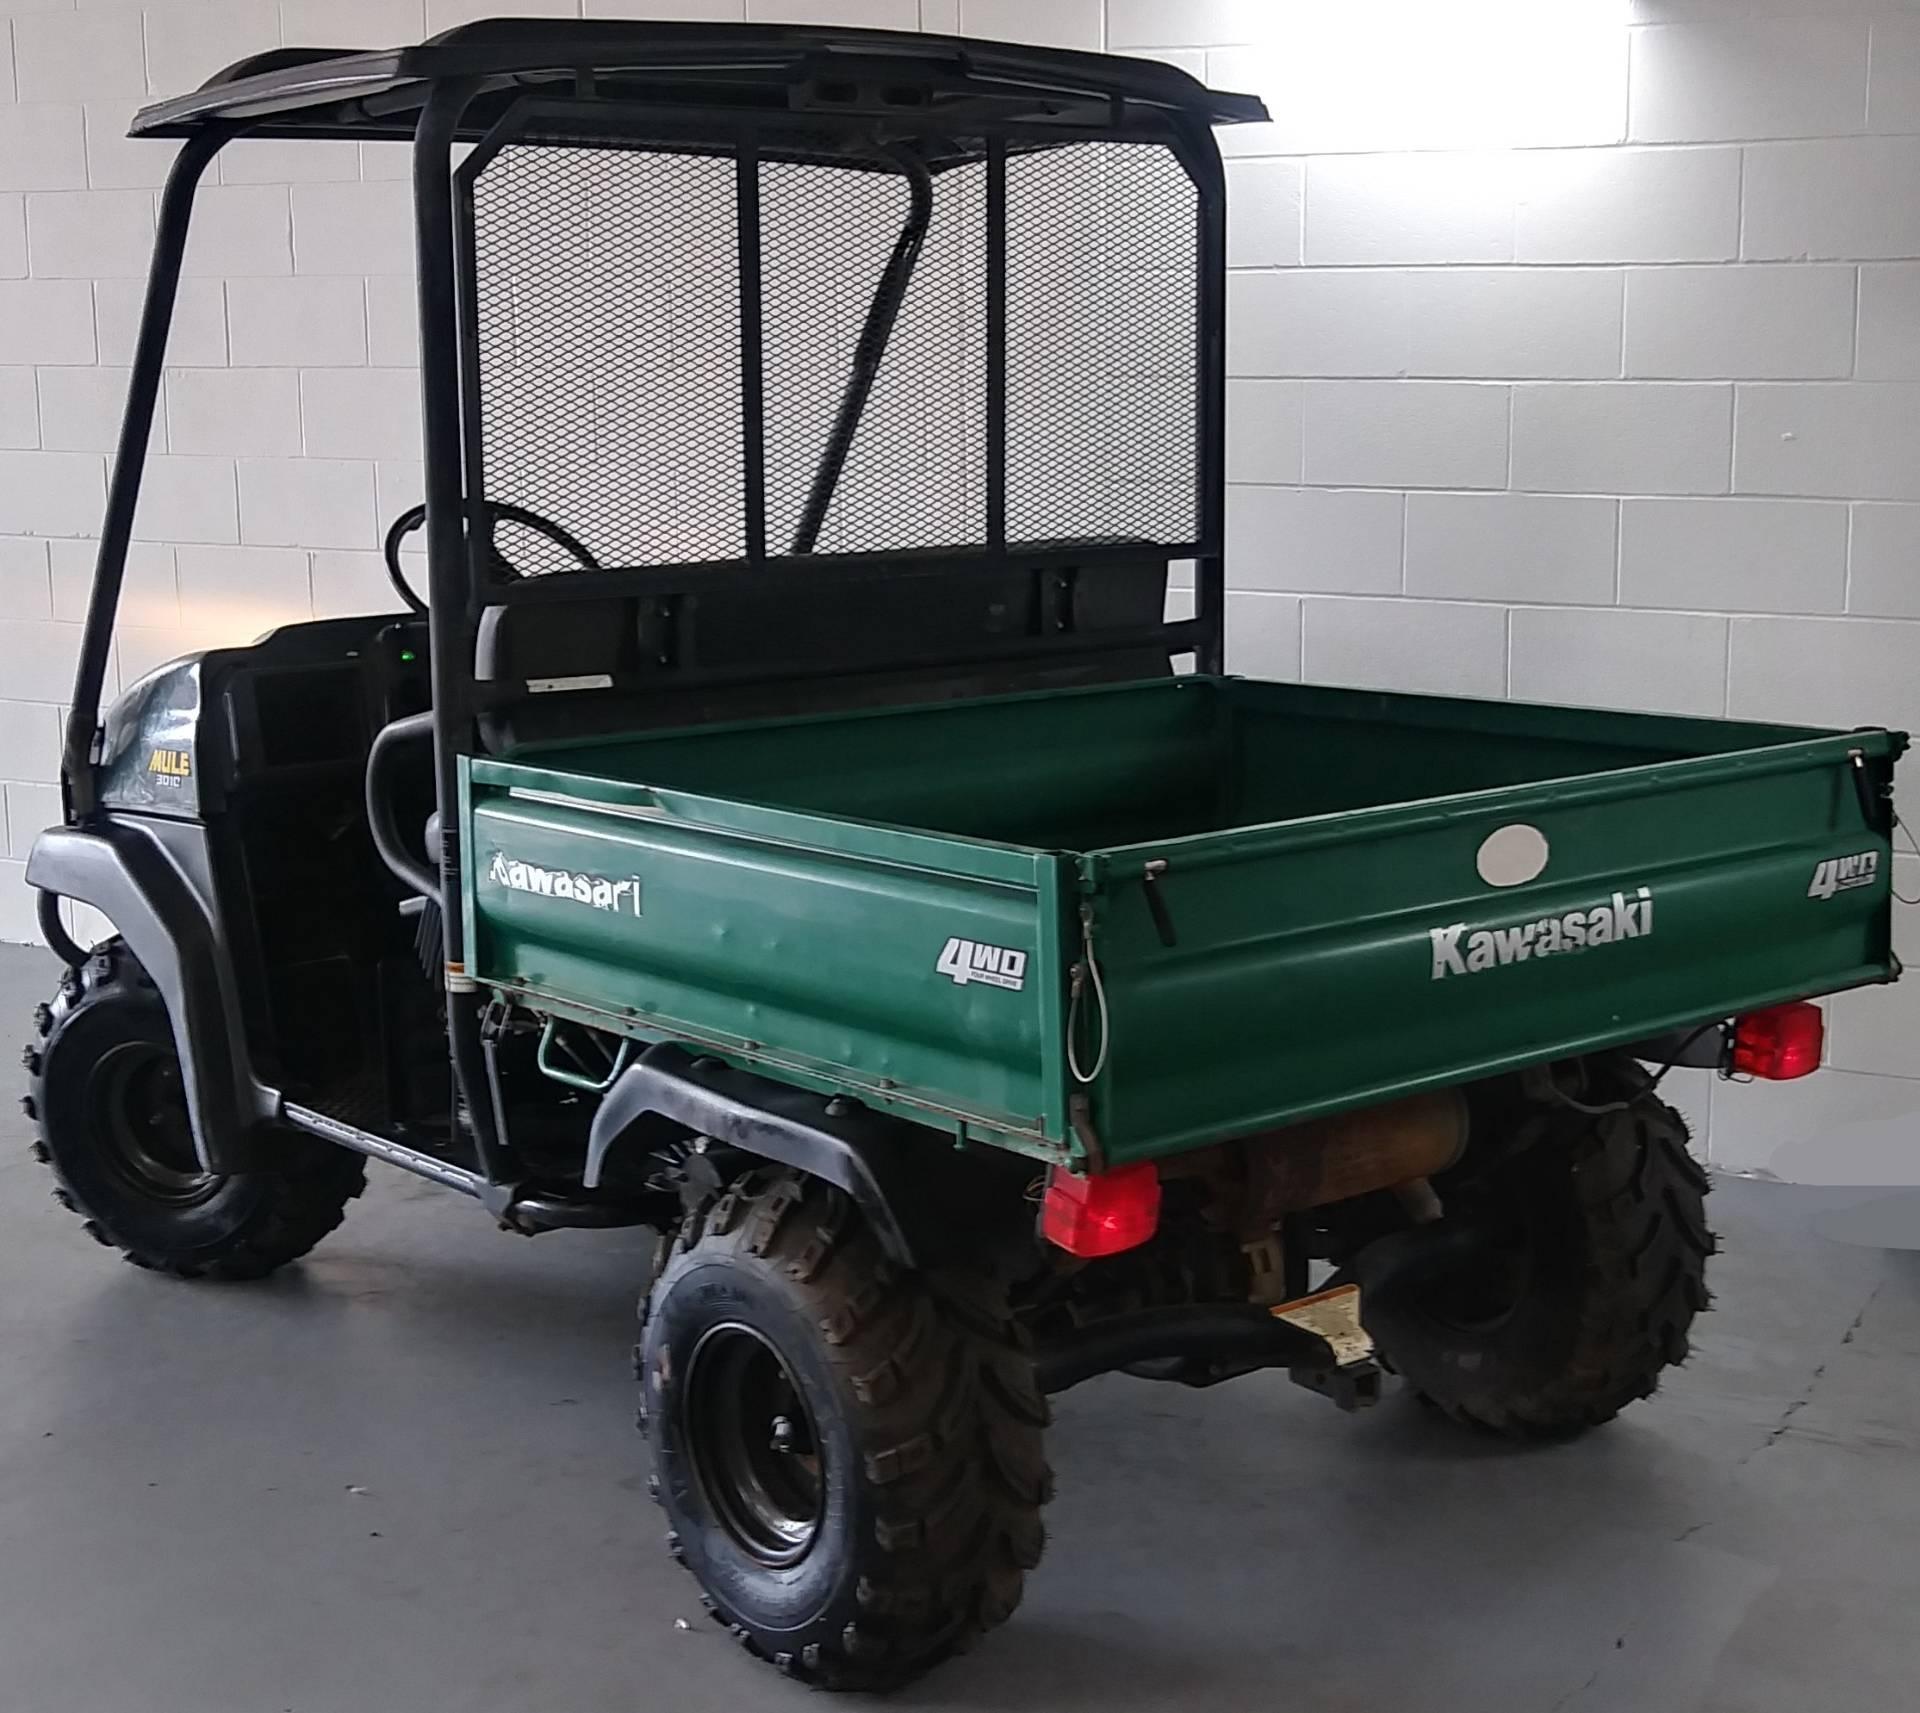 2007 Kawasaki Mule™ 3010 4x4 in Stillwater, Oklahoma